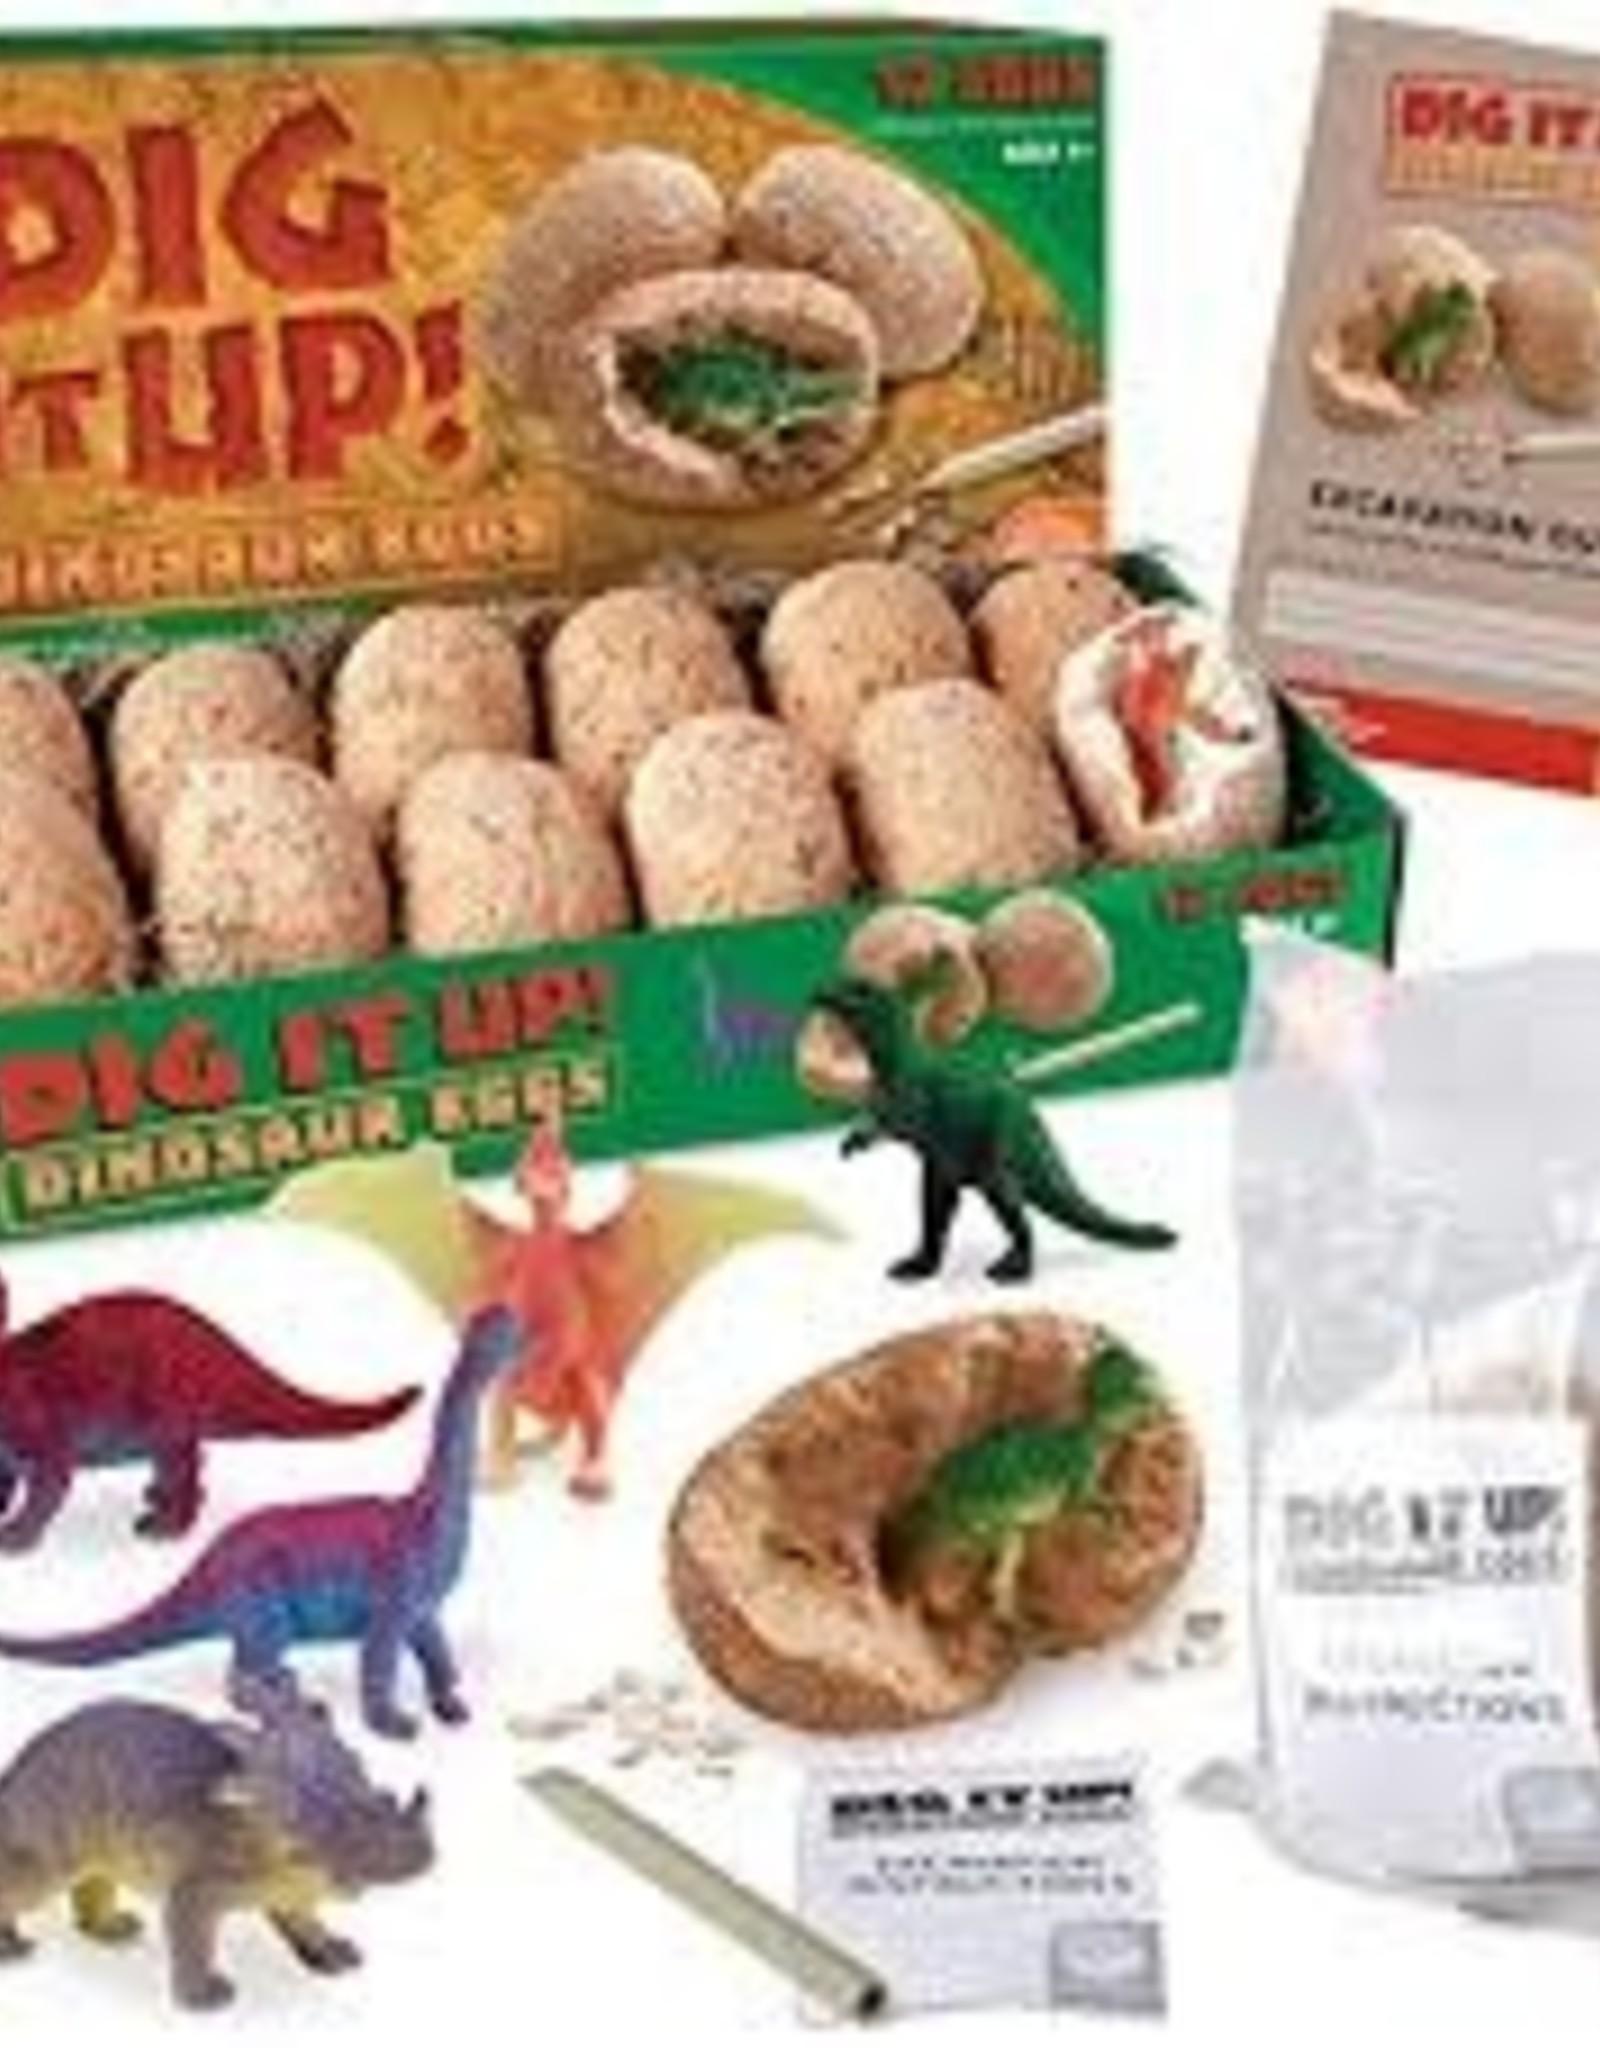 MindWare Dig It Up! Dinosaur Egg (singles)